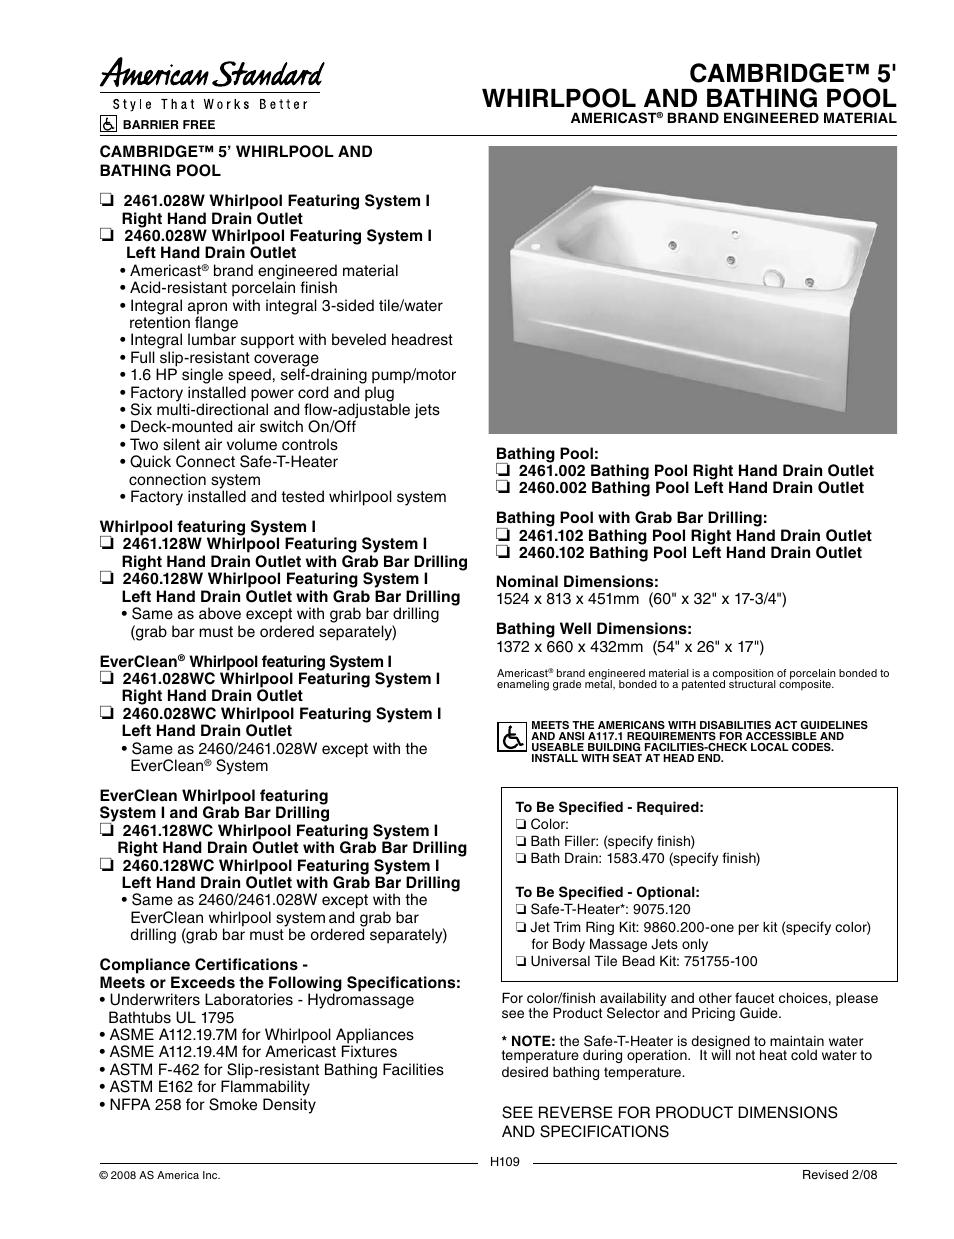 american standard cambridge 2461 102 user manual 2 pages also rh manualsdir com Standard ASTM E162 ASTM Flammability Test